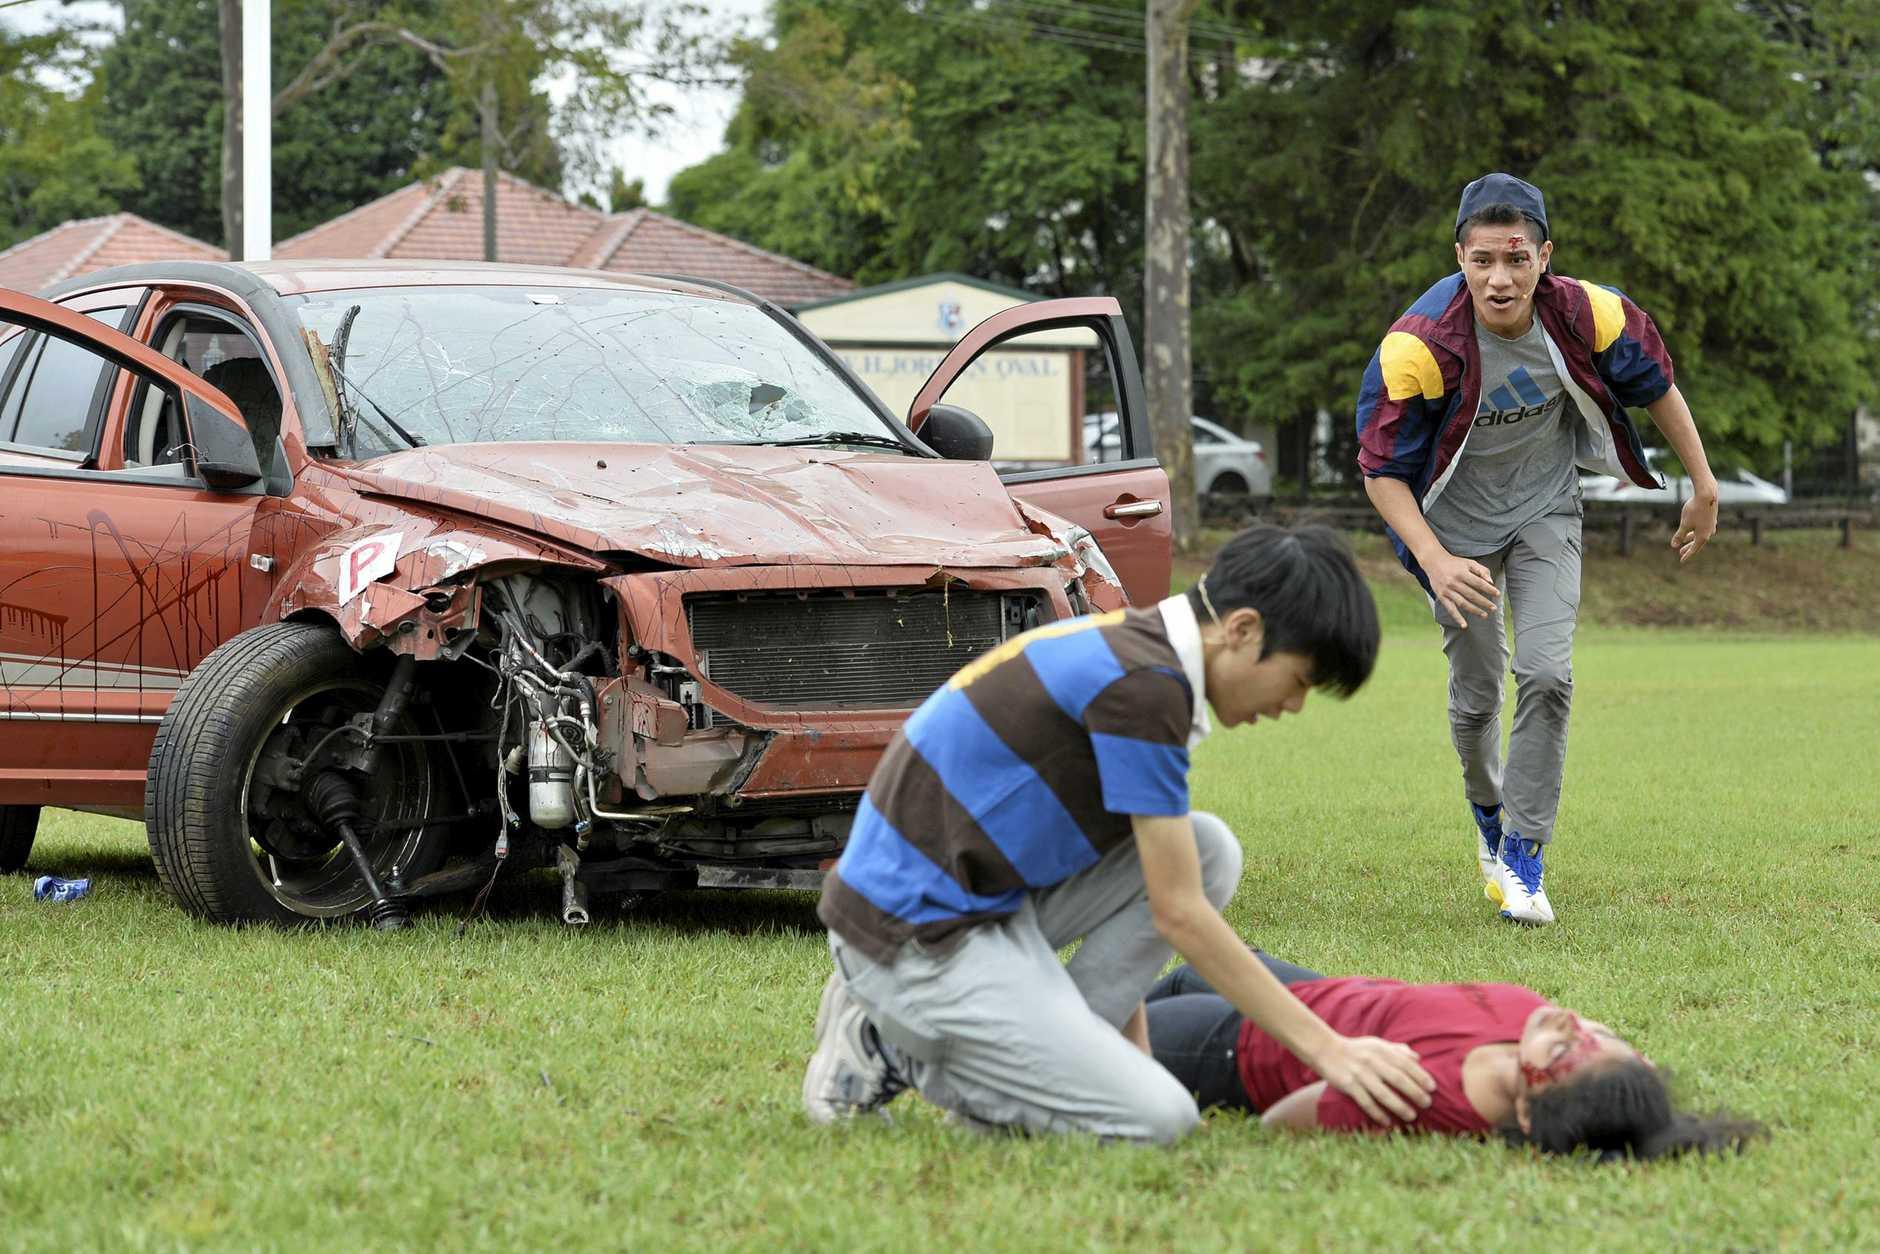 TACAPS students (from left) Joseph Goh, Jasmine Barui and Kalisi Fonua act out the fatal car crash scenario as part of road safety education program, RACQ Docudrama, Tuesday, February 20, 2018.